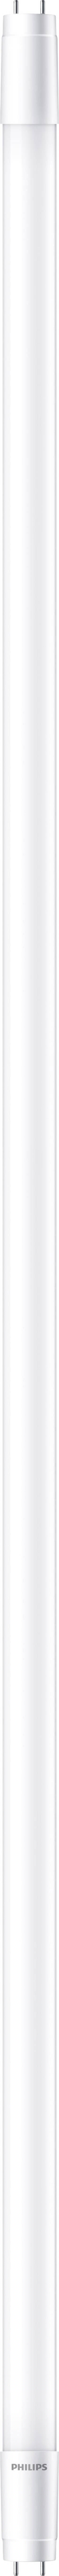 LED G13 Philips Lighting 8718696583517 en forme de tube 16 W=36 W blanc neutre (Ø x L) 28 mm x 1200 mm EEC: classe A+